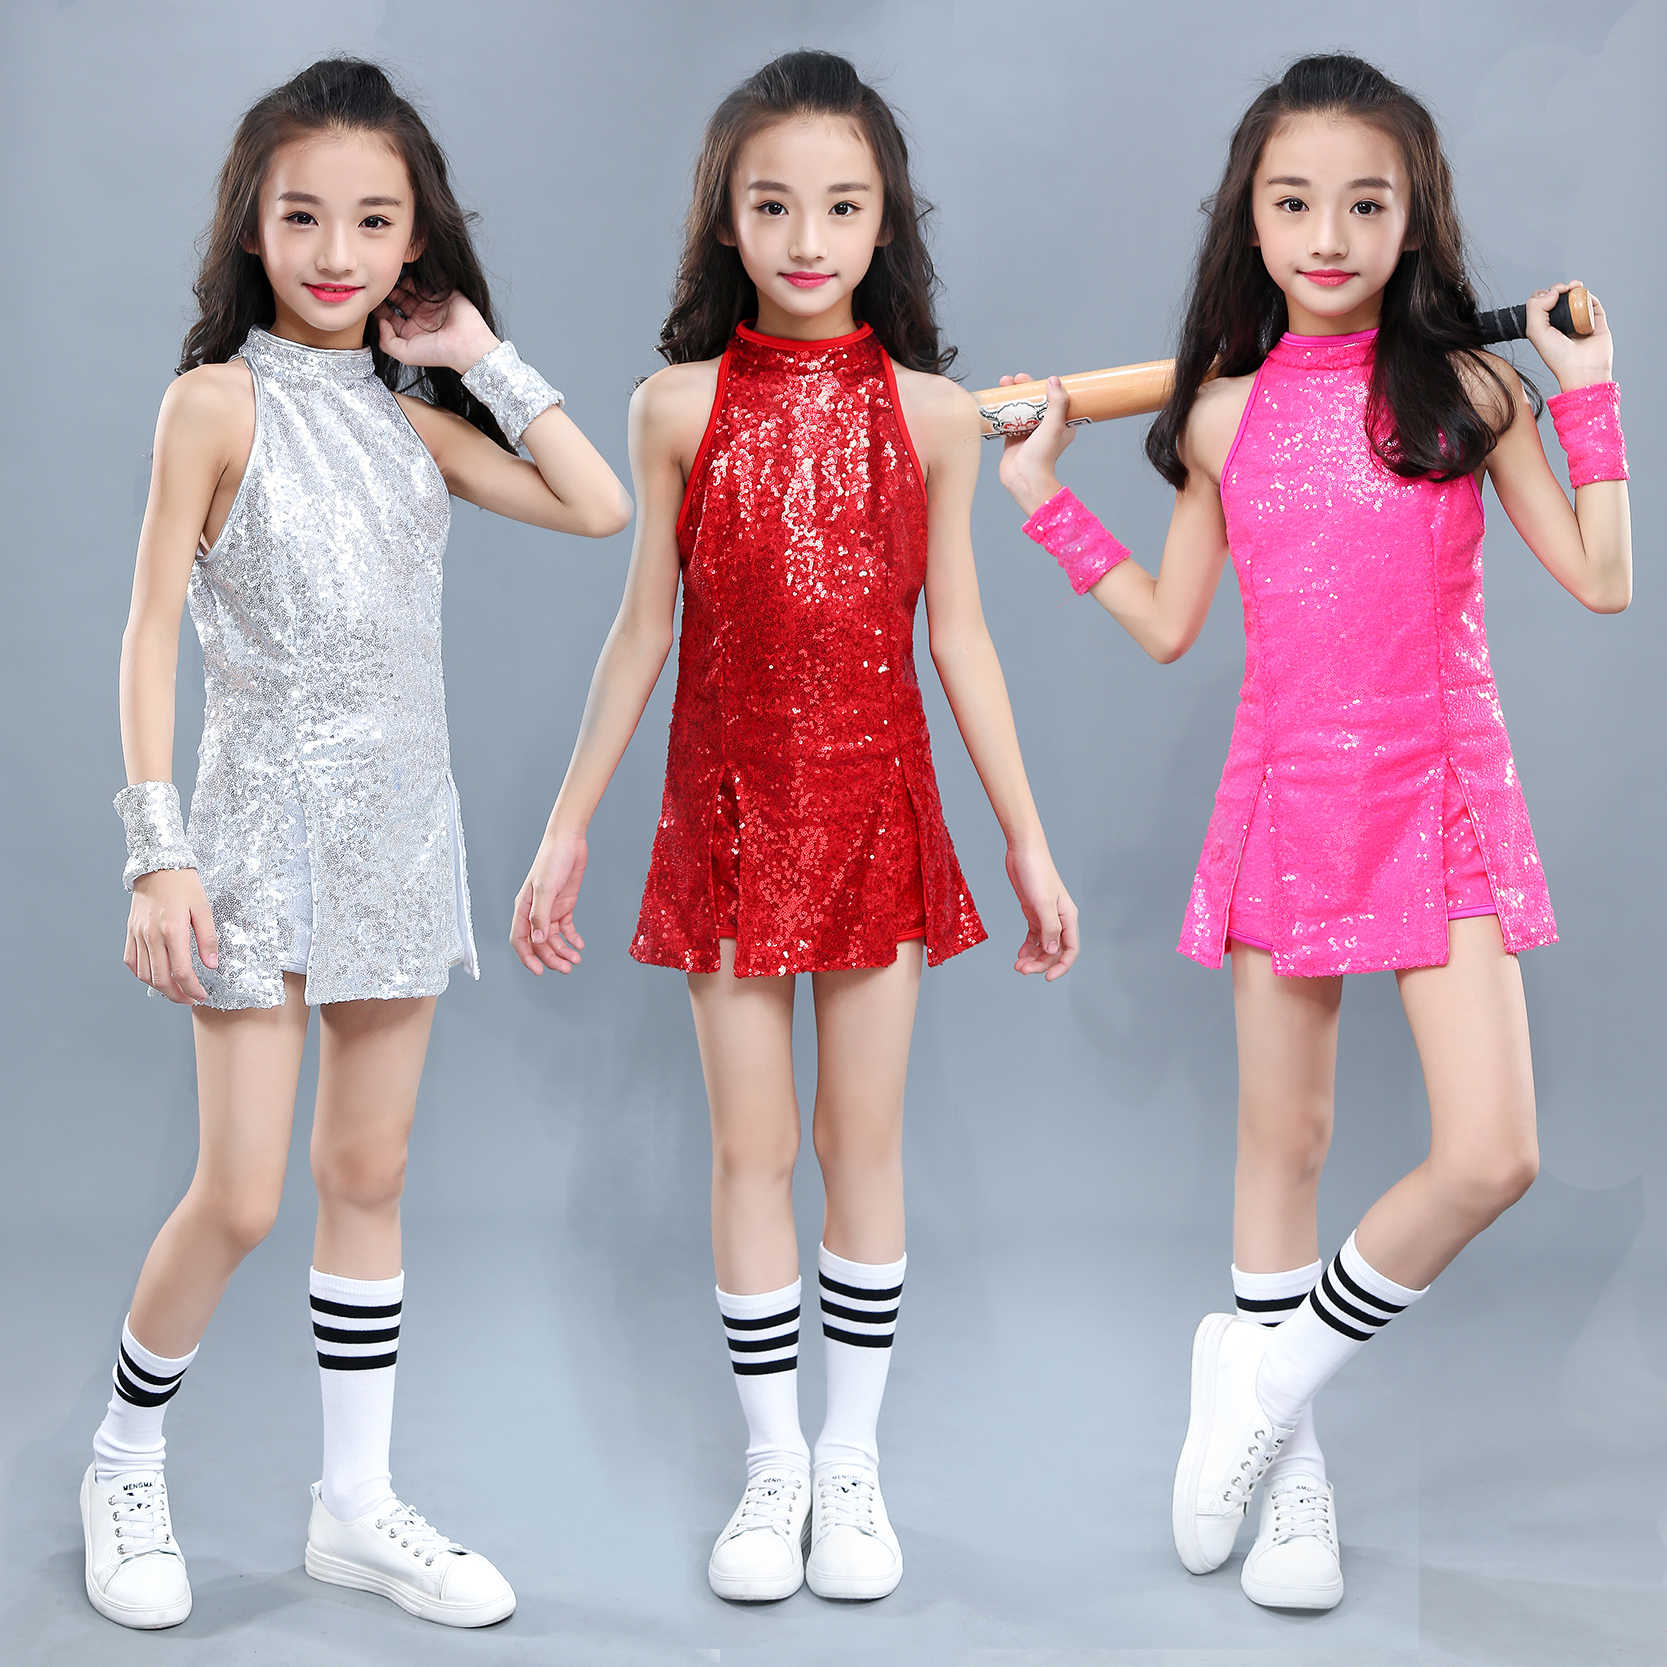 ac9b872f5 Paillette Children Jazz Dance Costume for Stage Performance Hip-hop Dance  Clothing Cheerleading Uniform Street